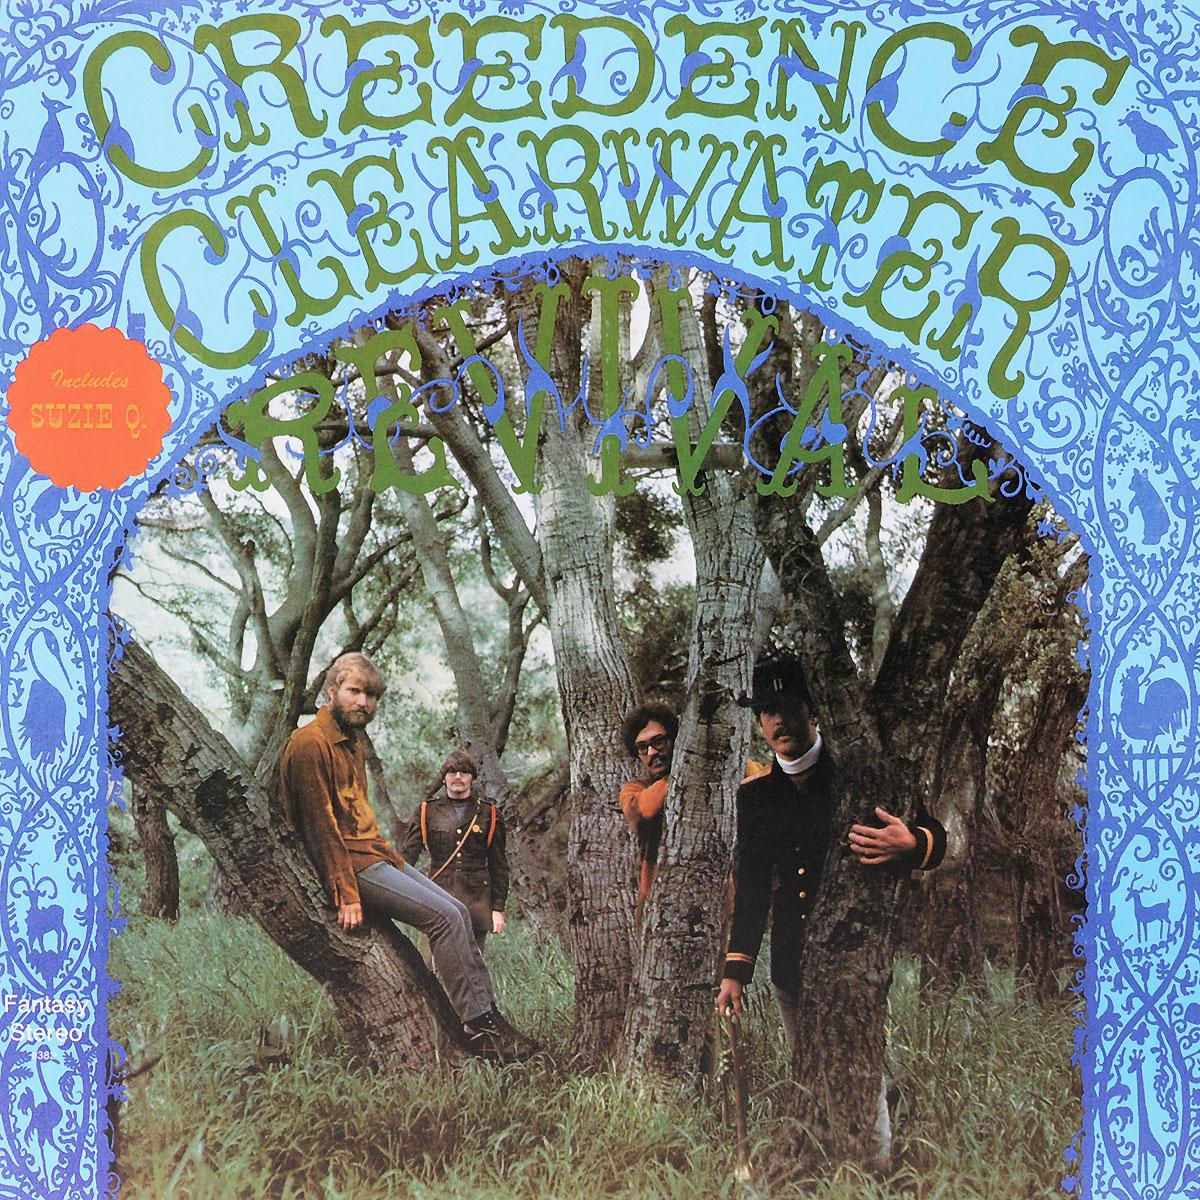 цена на Creedence Clearwater Revival Creedence Clearwater Revival. Creedence Clearwater Revival (LP)